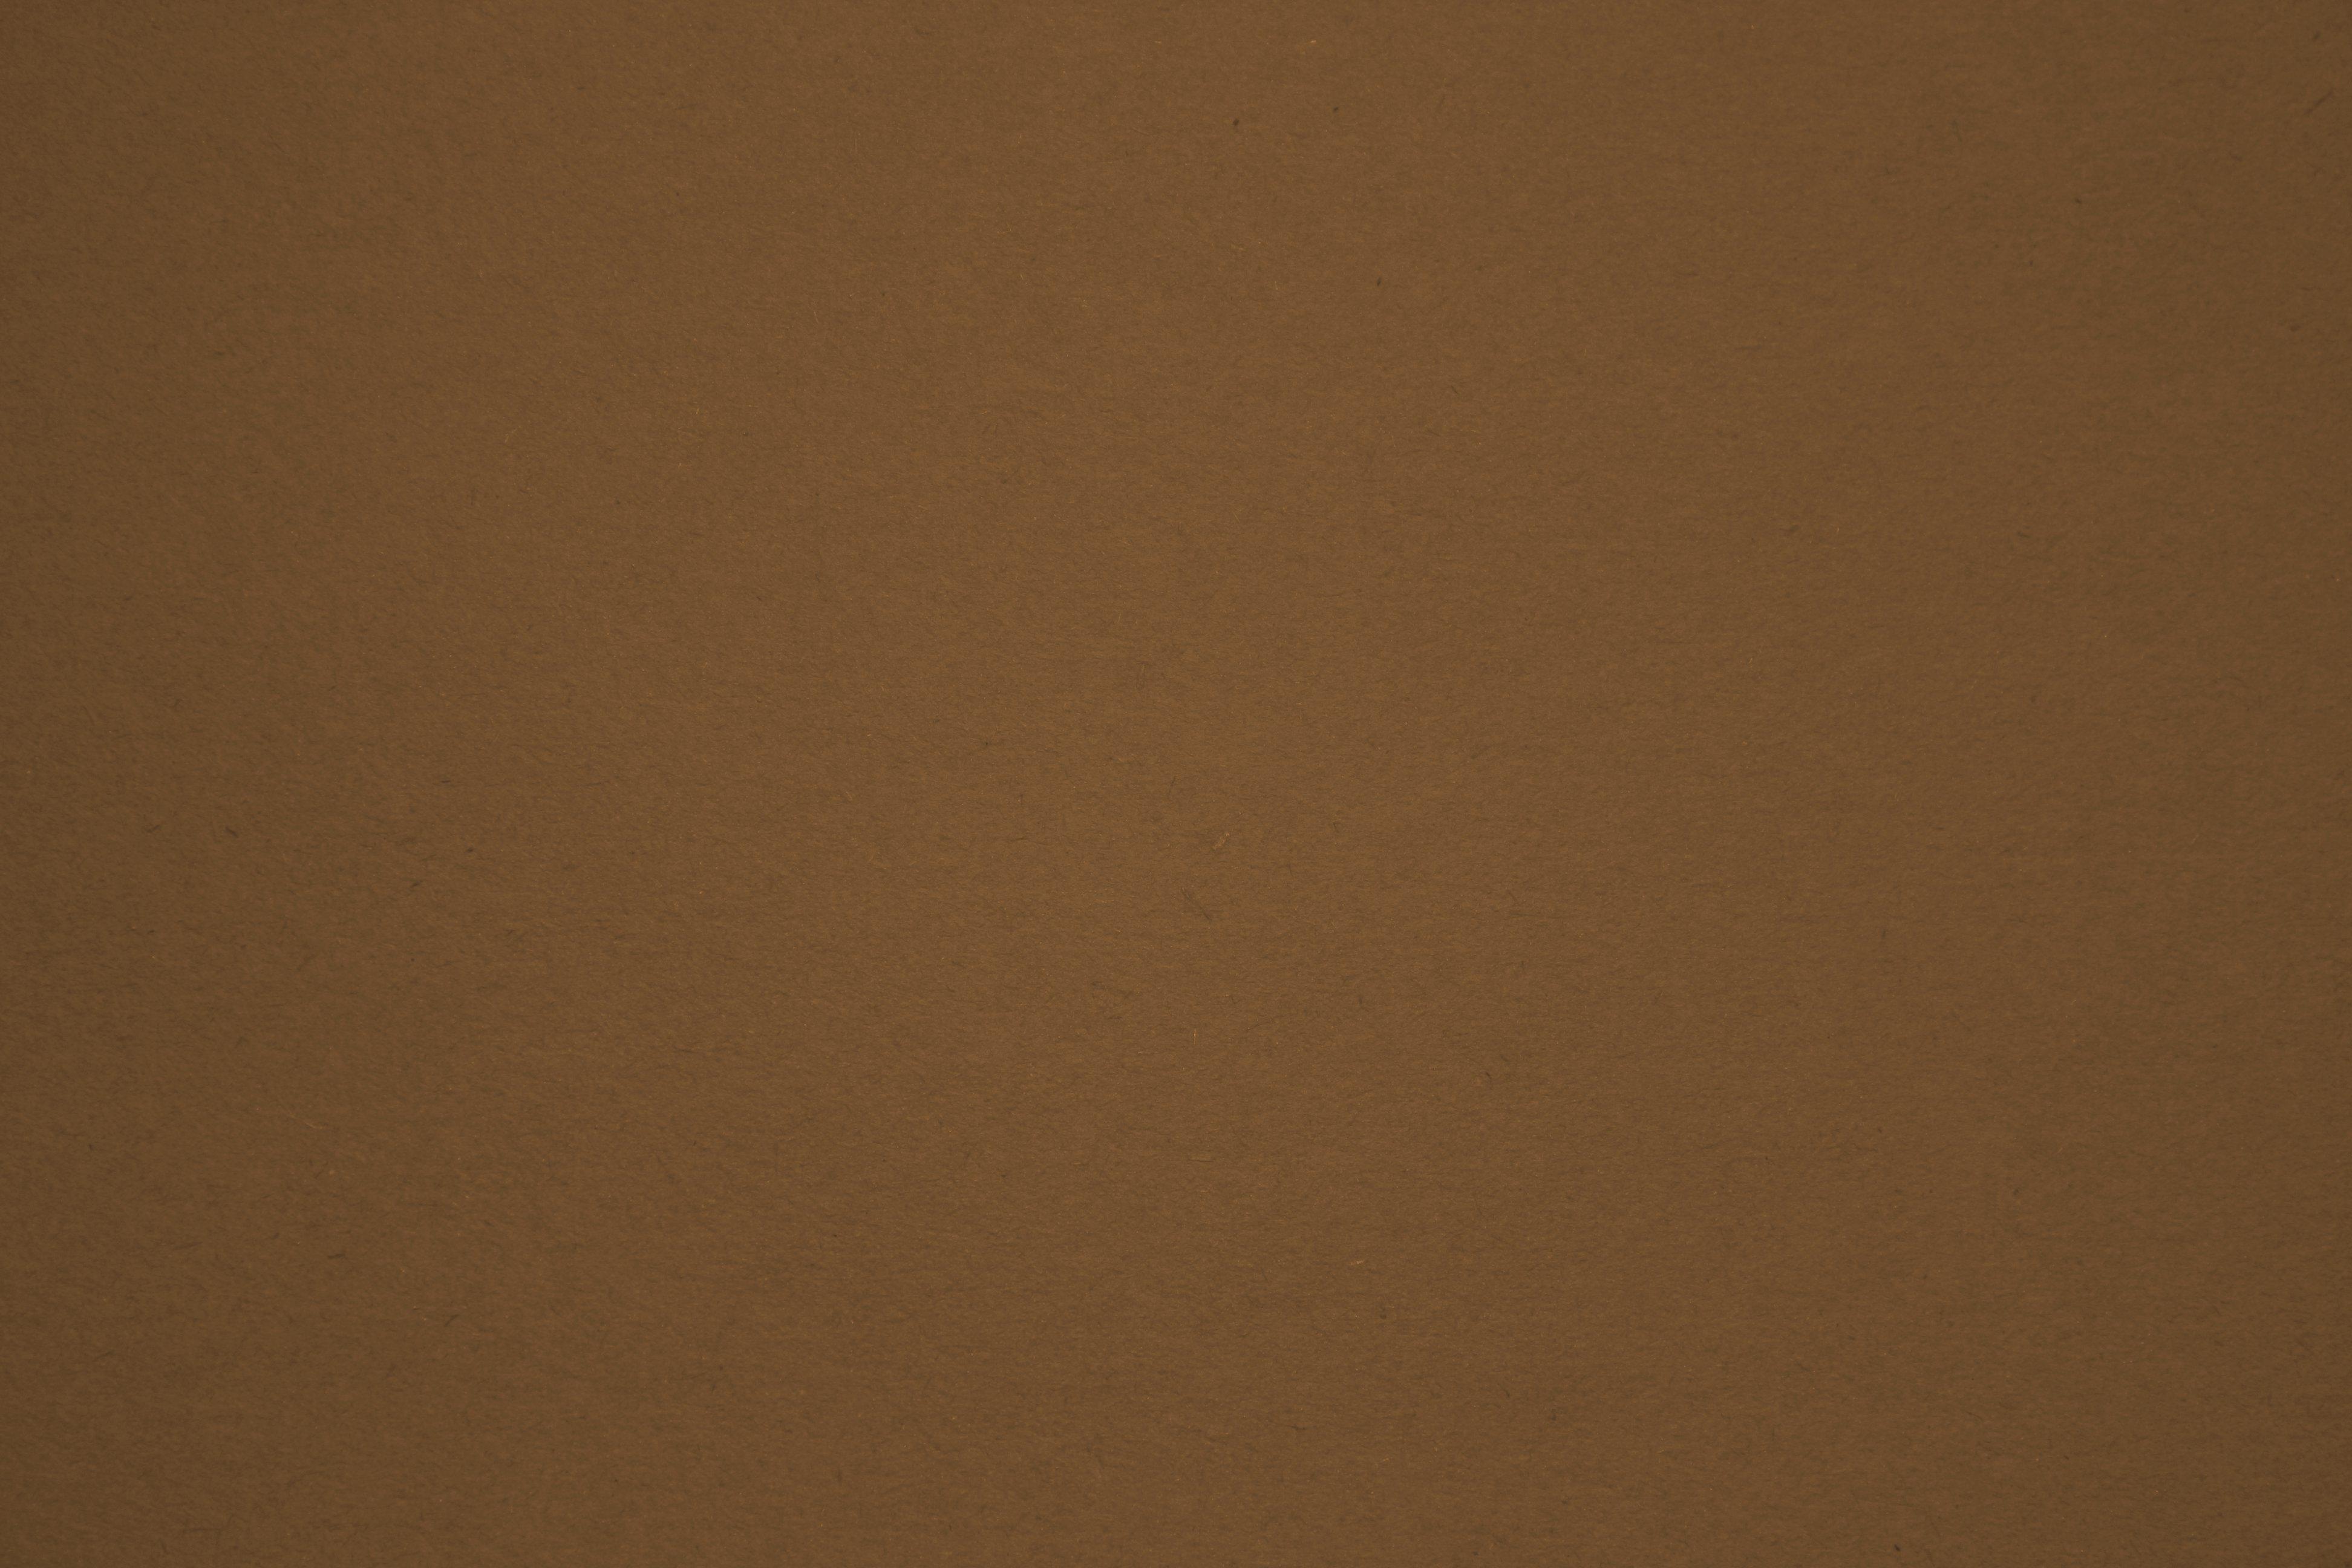 1920x1200 Brown Windows Wallpaper Abstract Brown Wallpaper 3888x2592